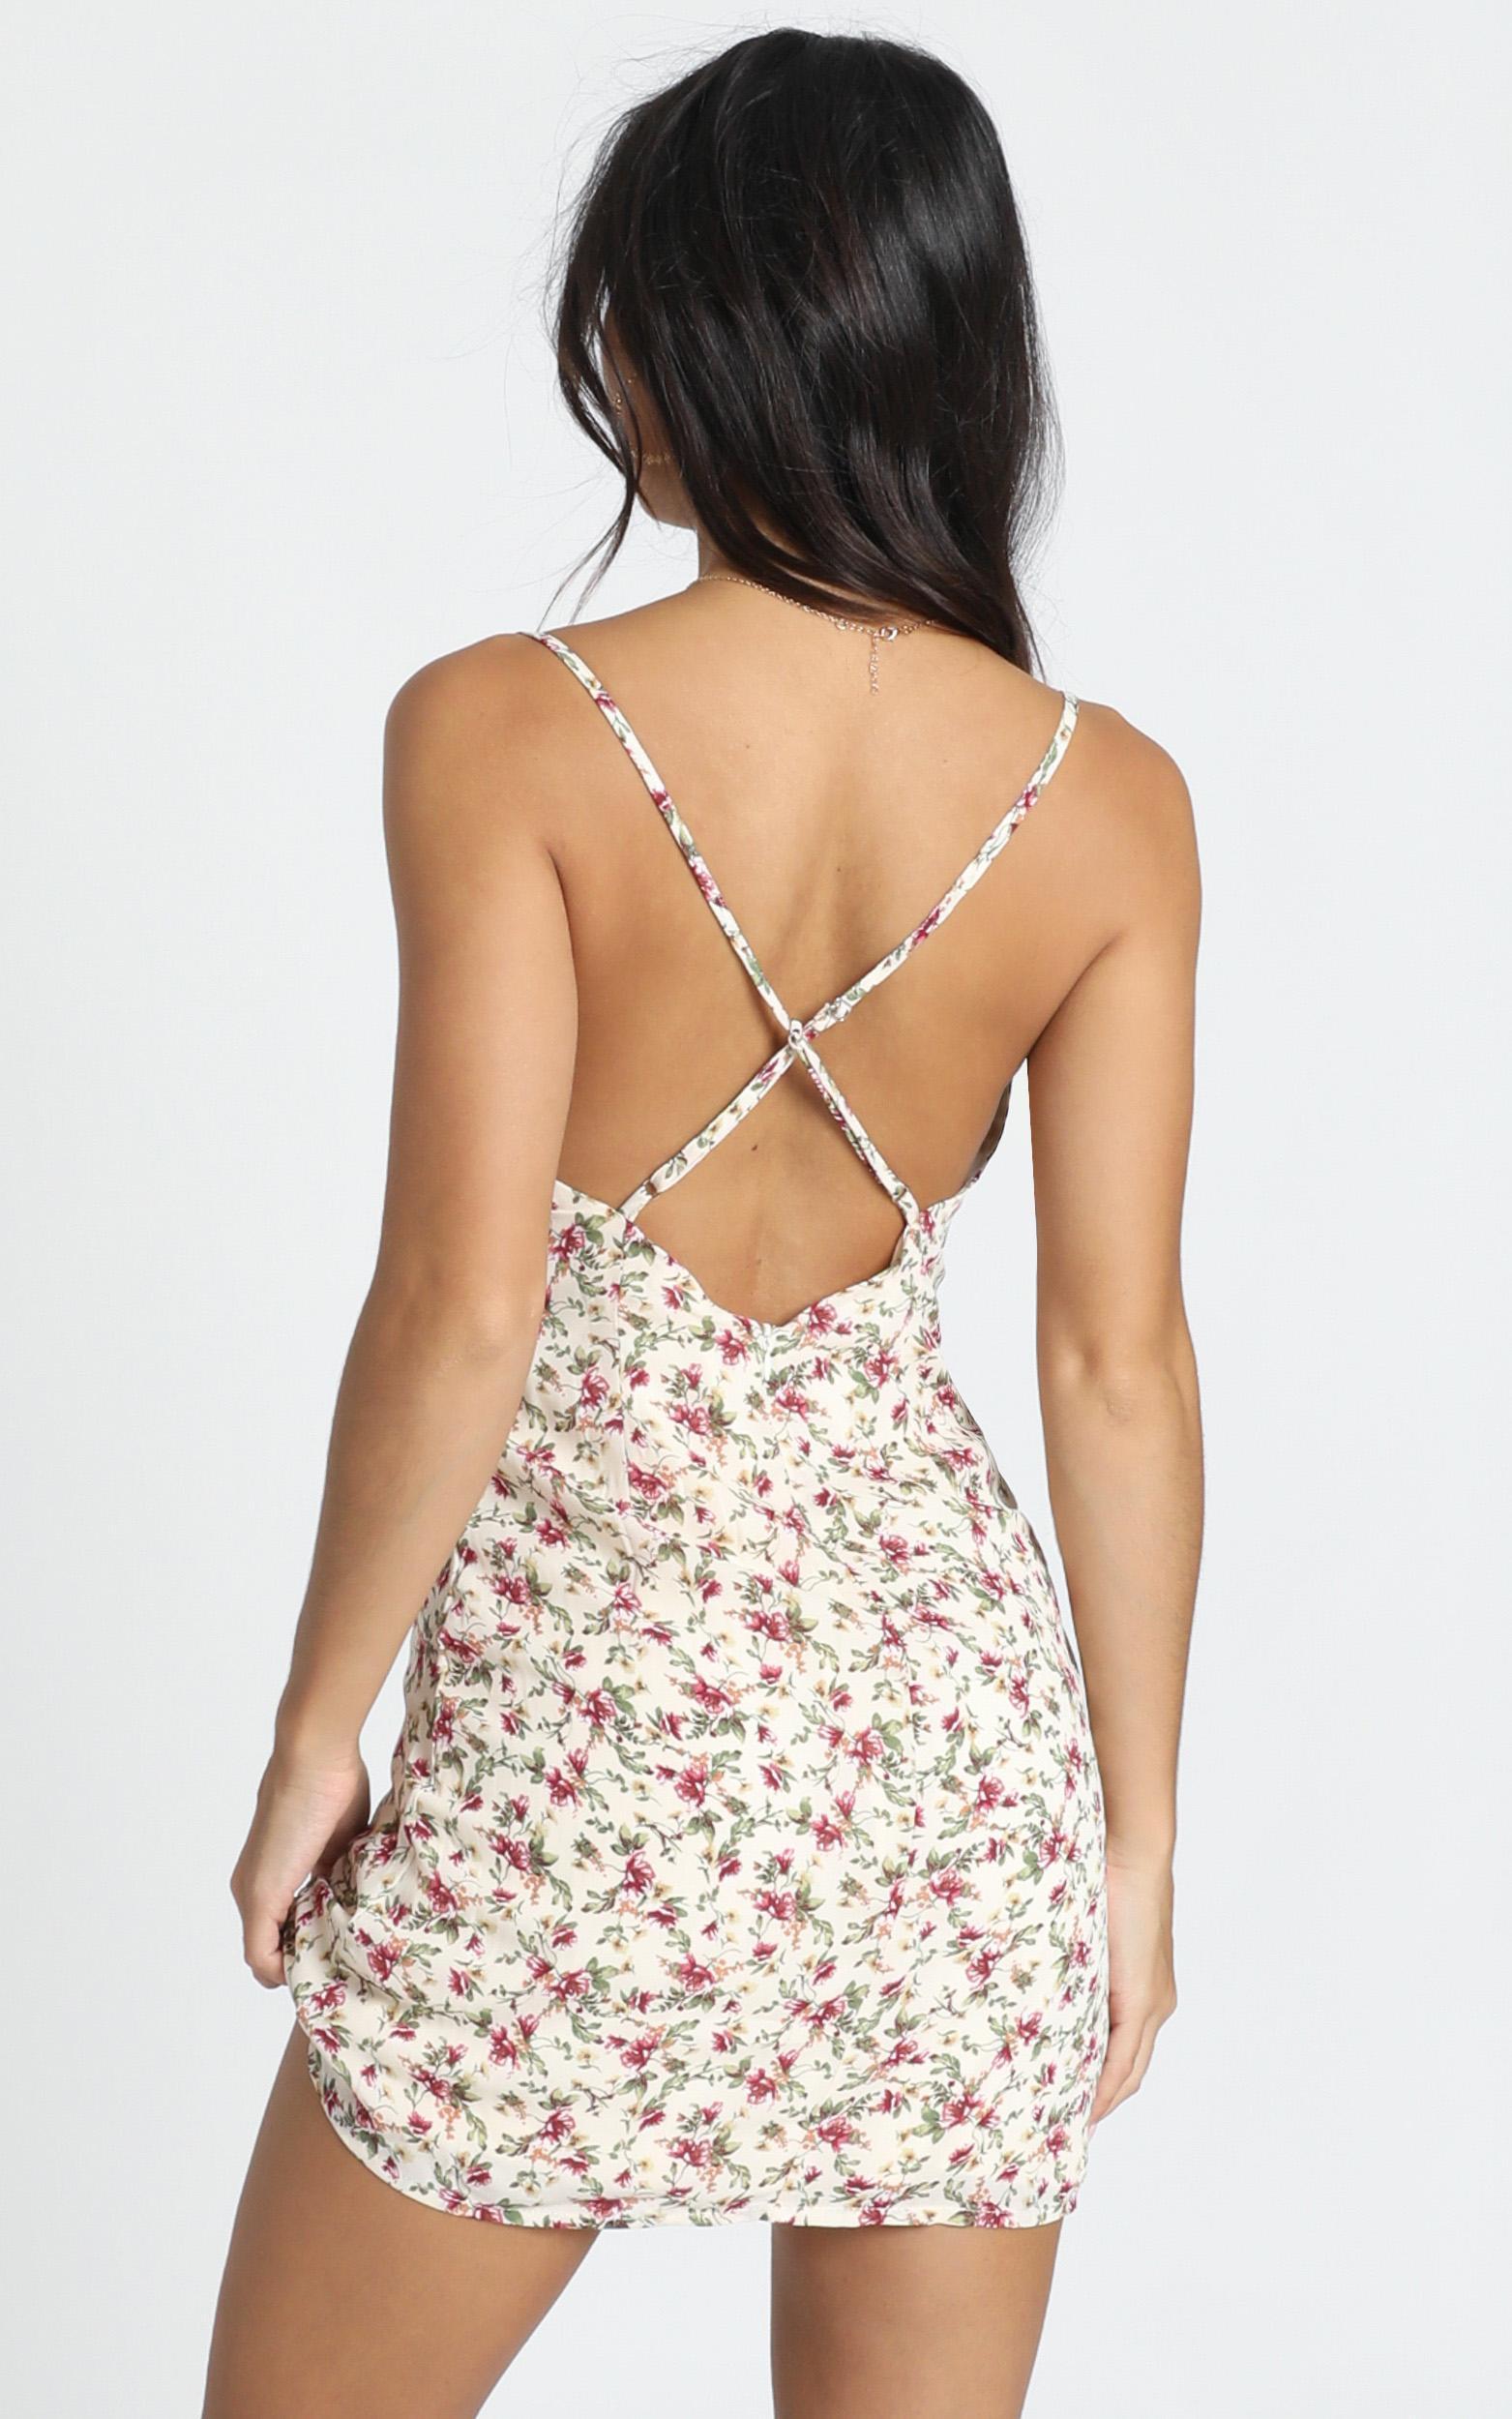 Summer Memory dress in cream floral - 12 (L), Cream, hi-res image number null